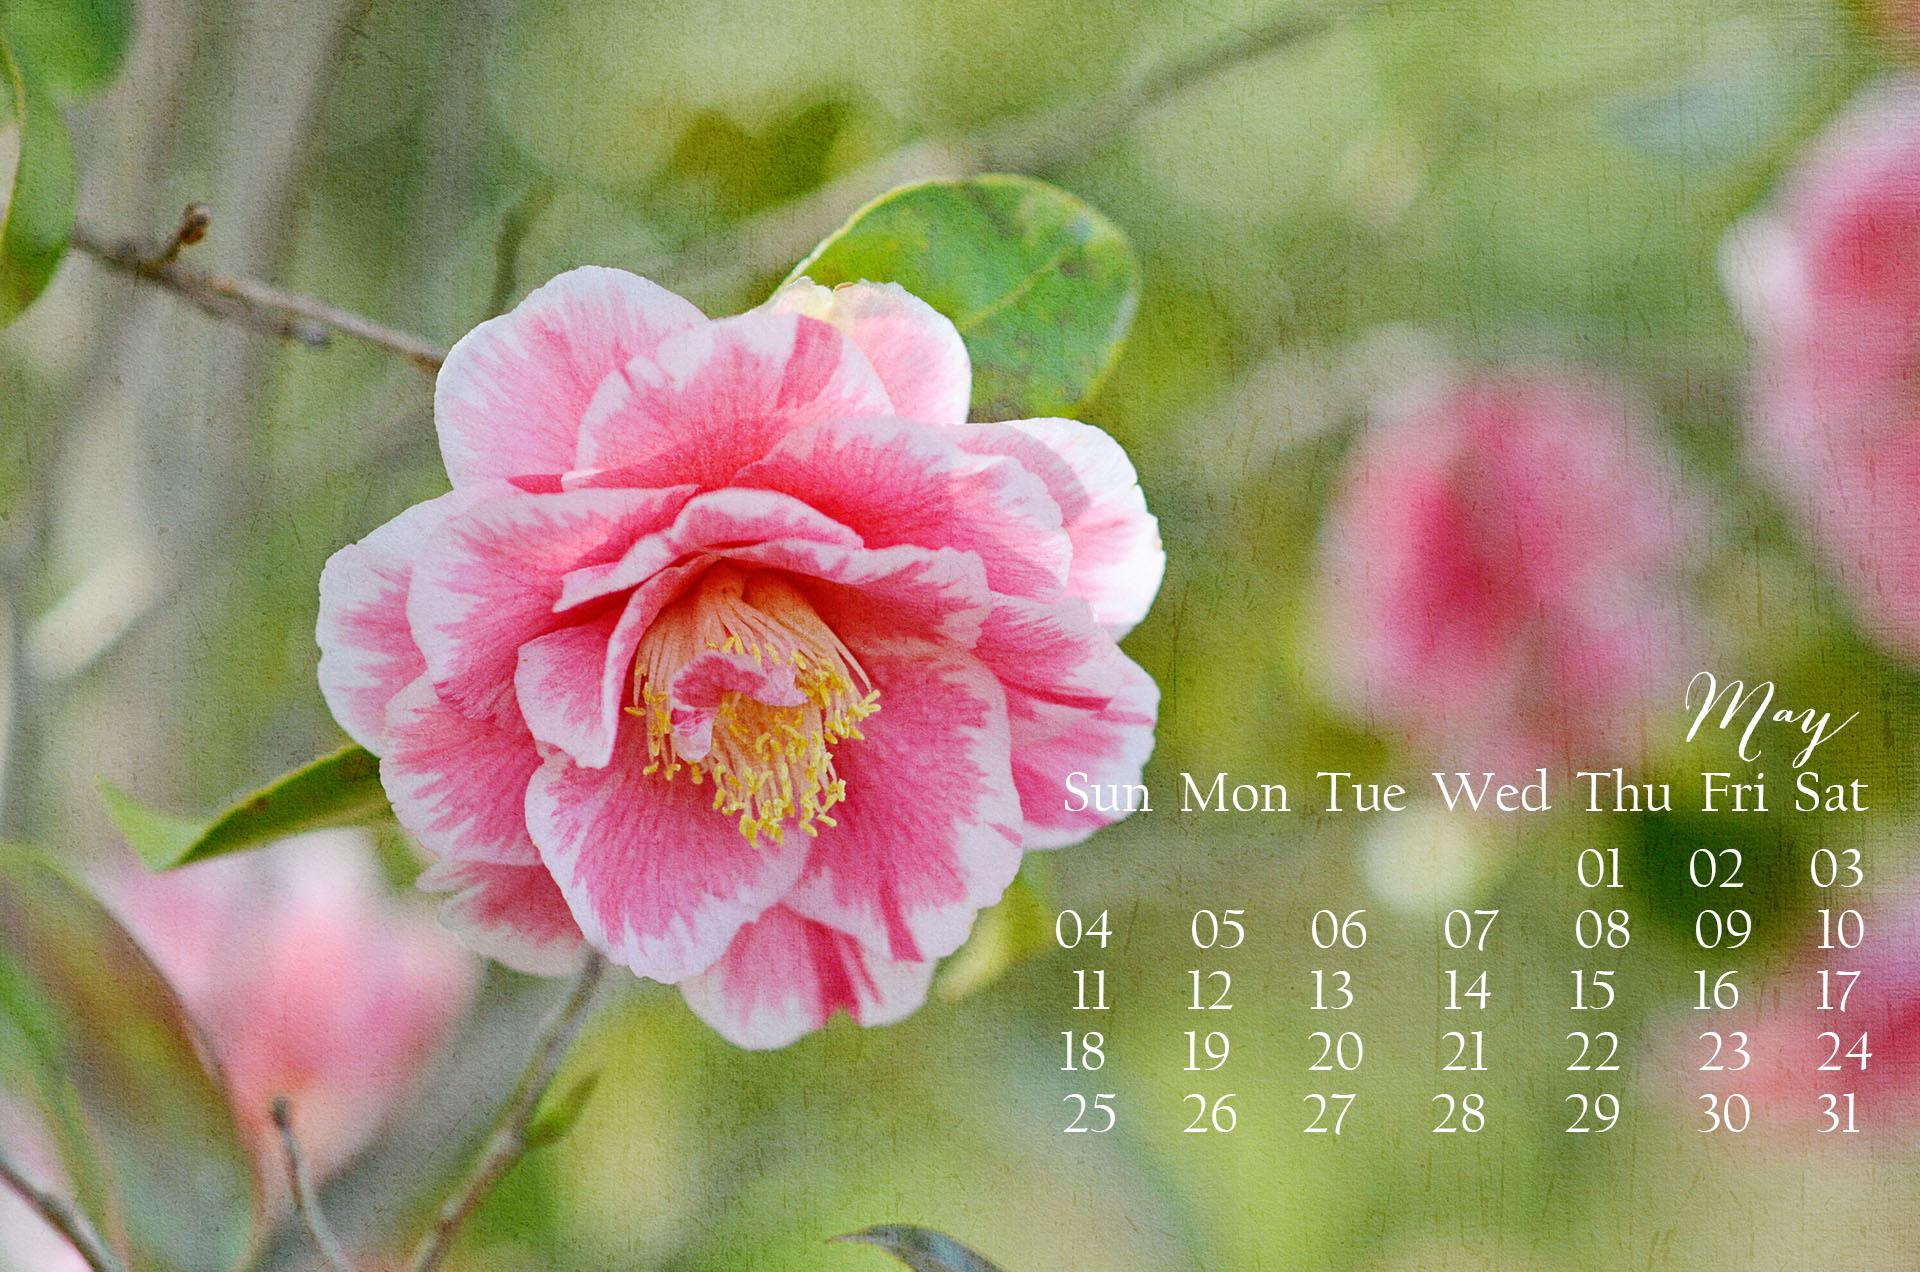 digital desktop wallpaper calendar customized for each month in 2015 1920x1272